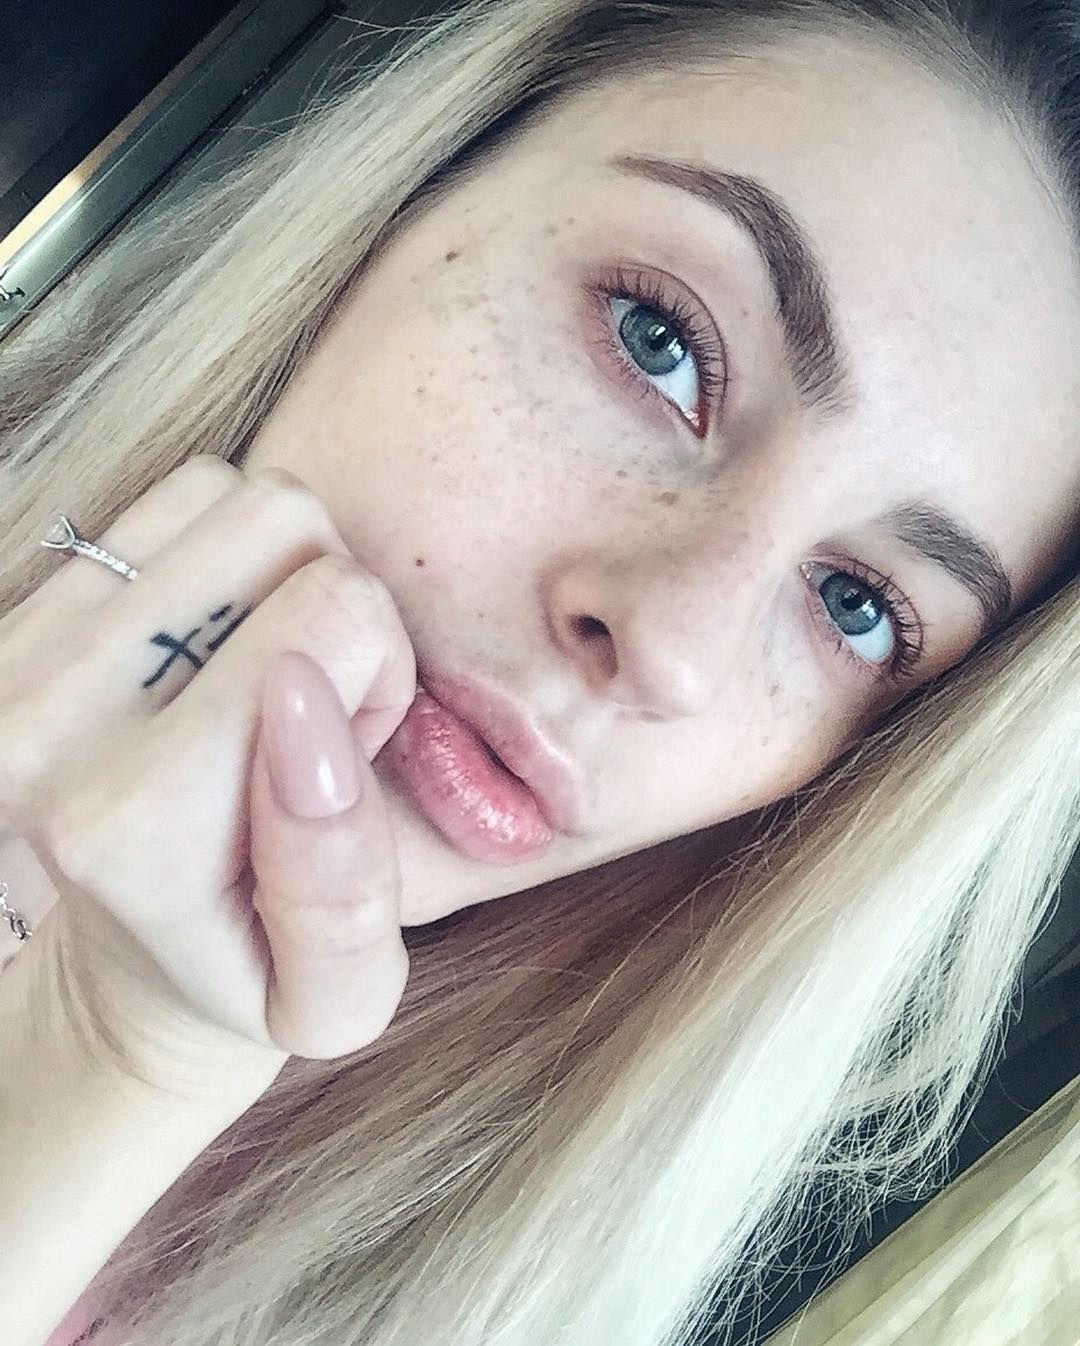 Longhairlorealprofessionnel blonde goldenblonde girlygirl